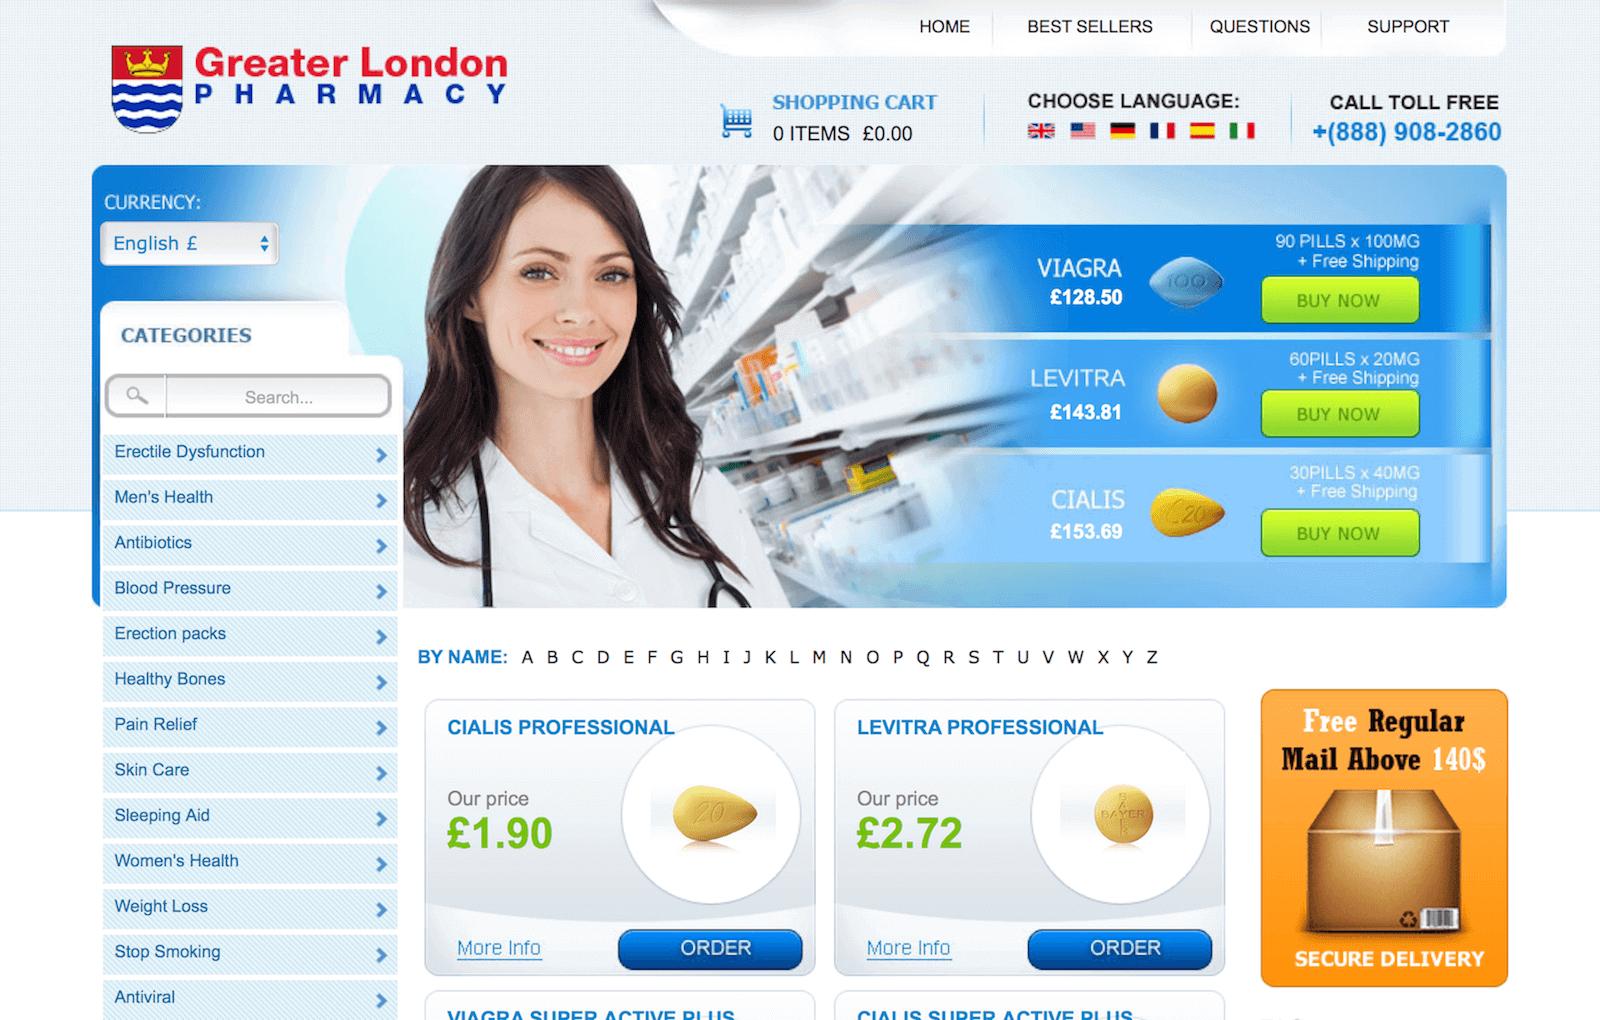 GreaterLondonPharmacy.com Pharmacy Review